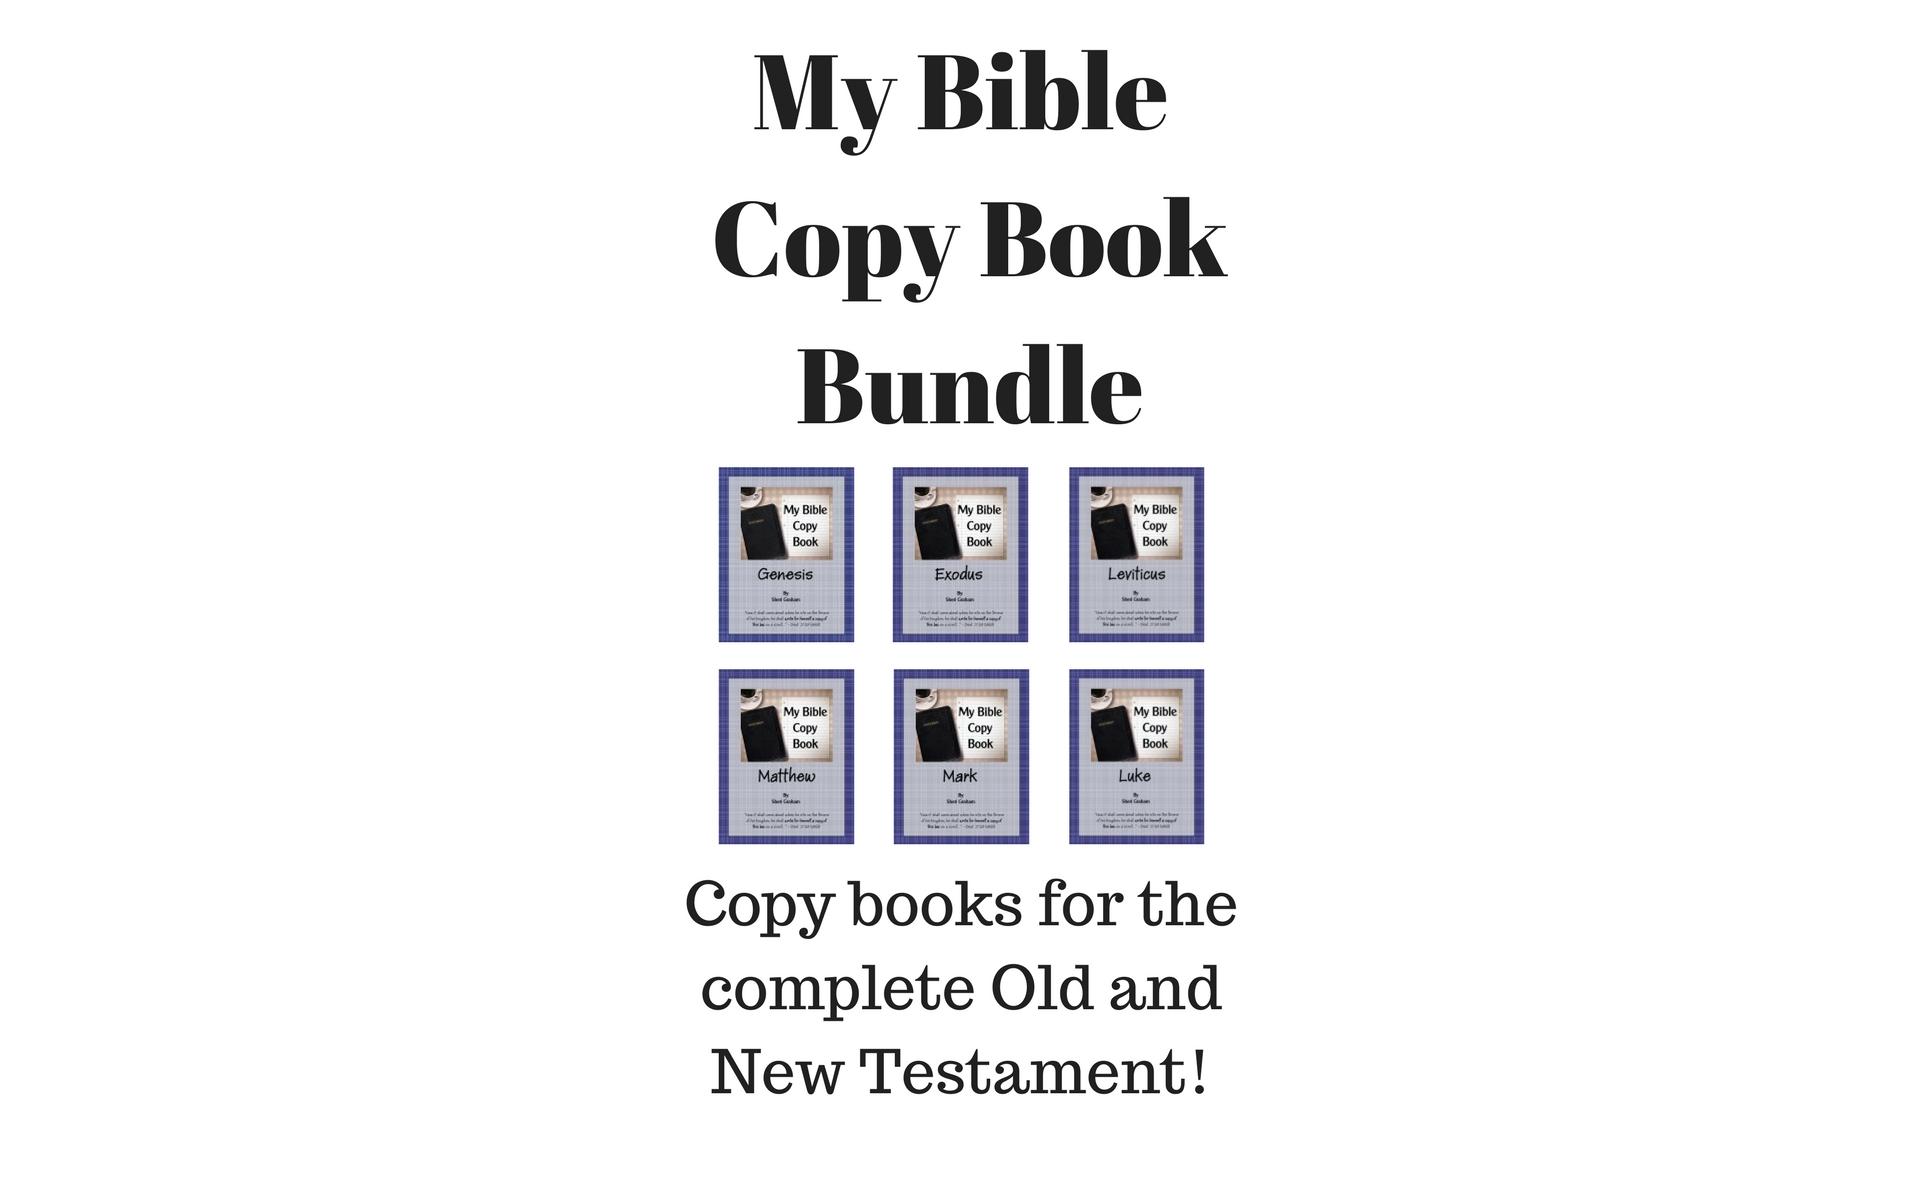 Ebook Bundle: My Bible Copy Book Bundle